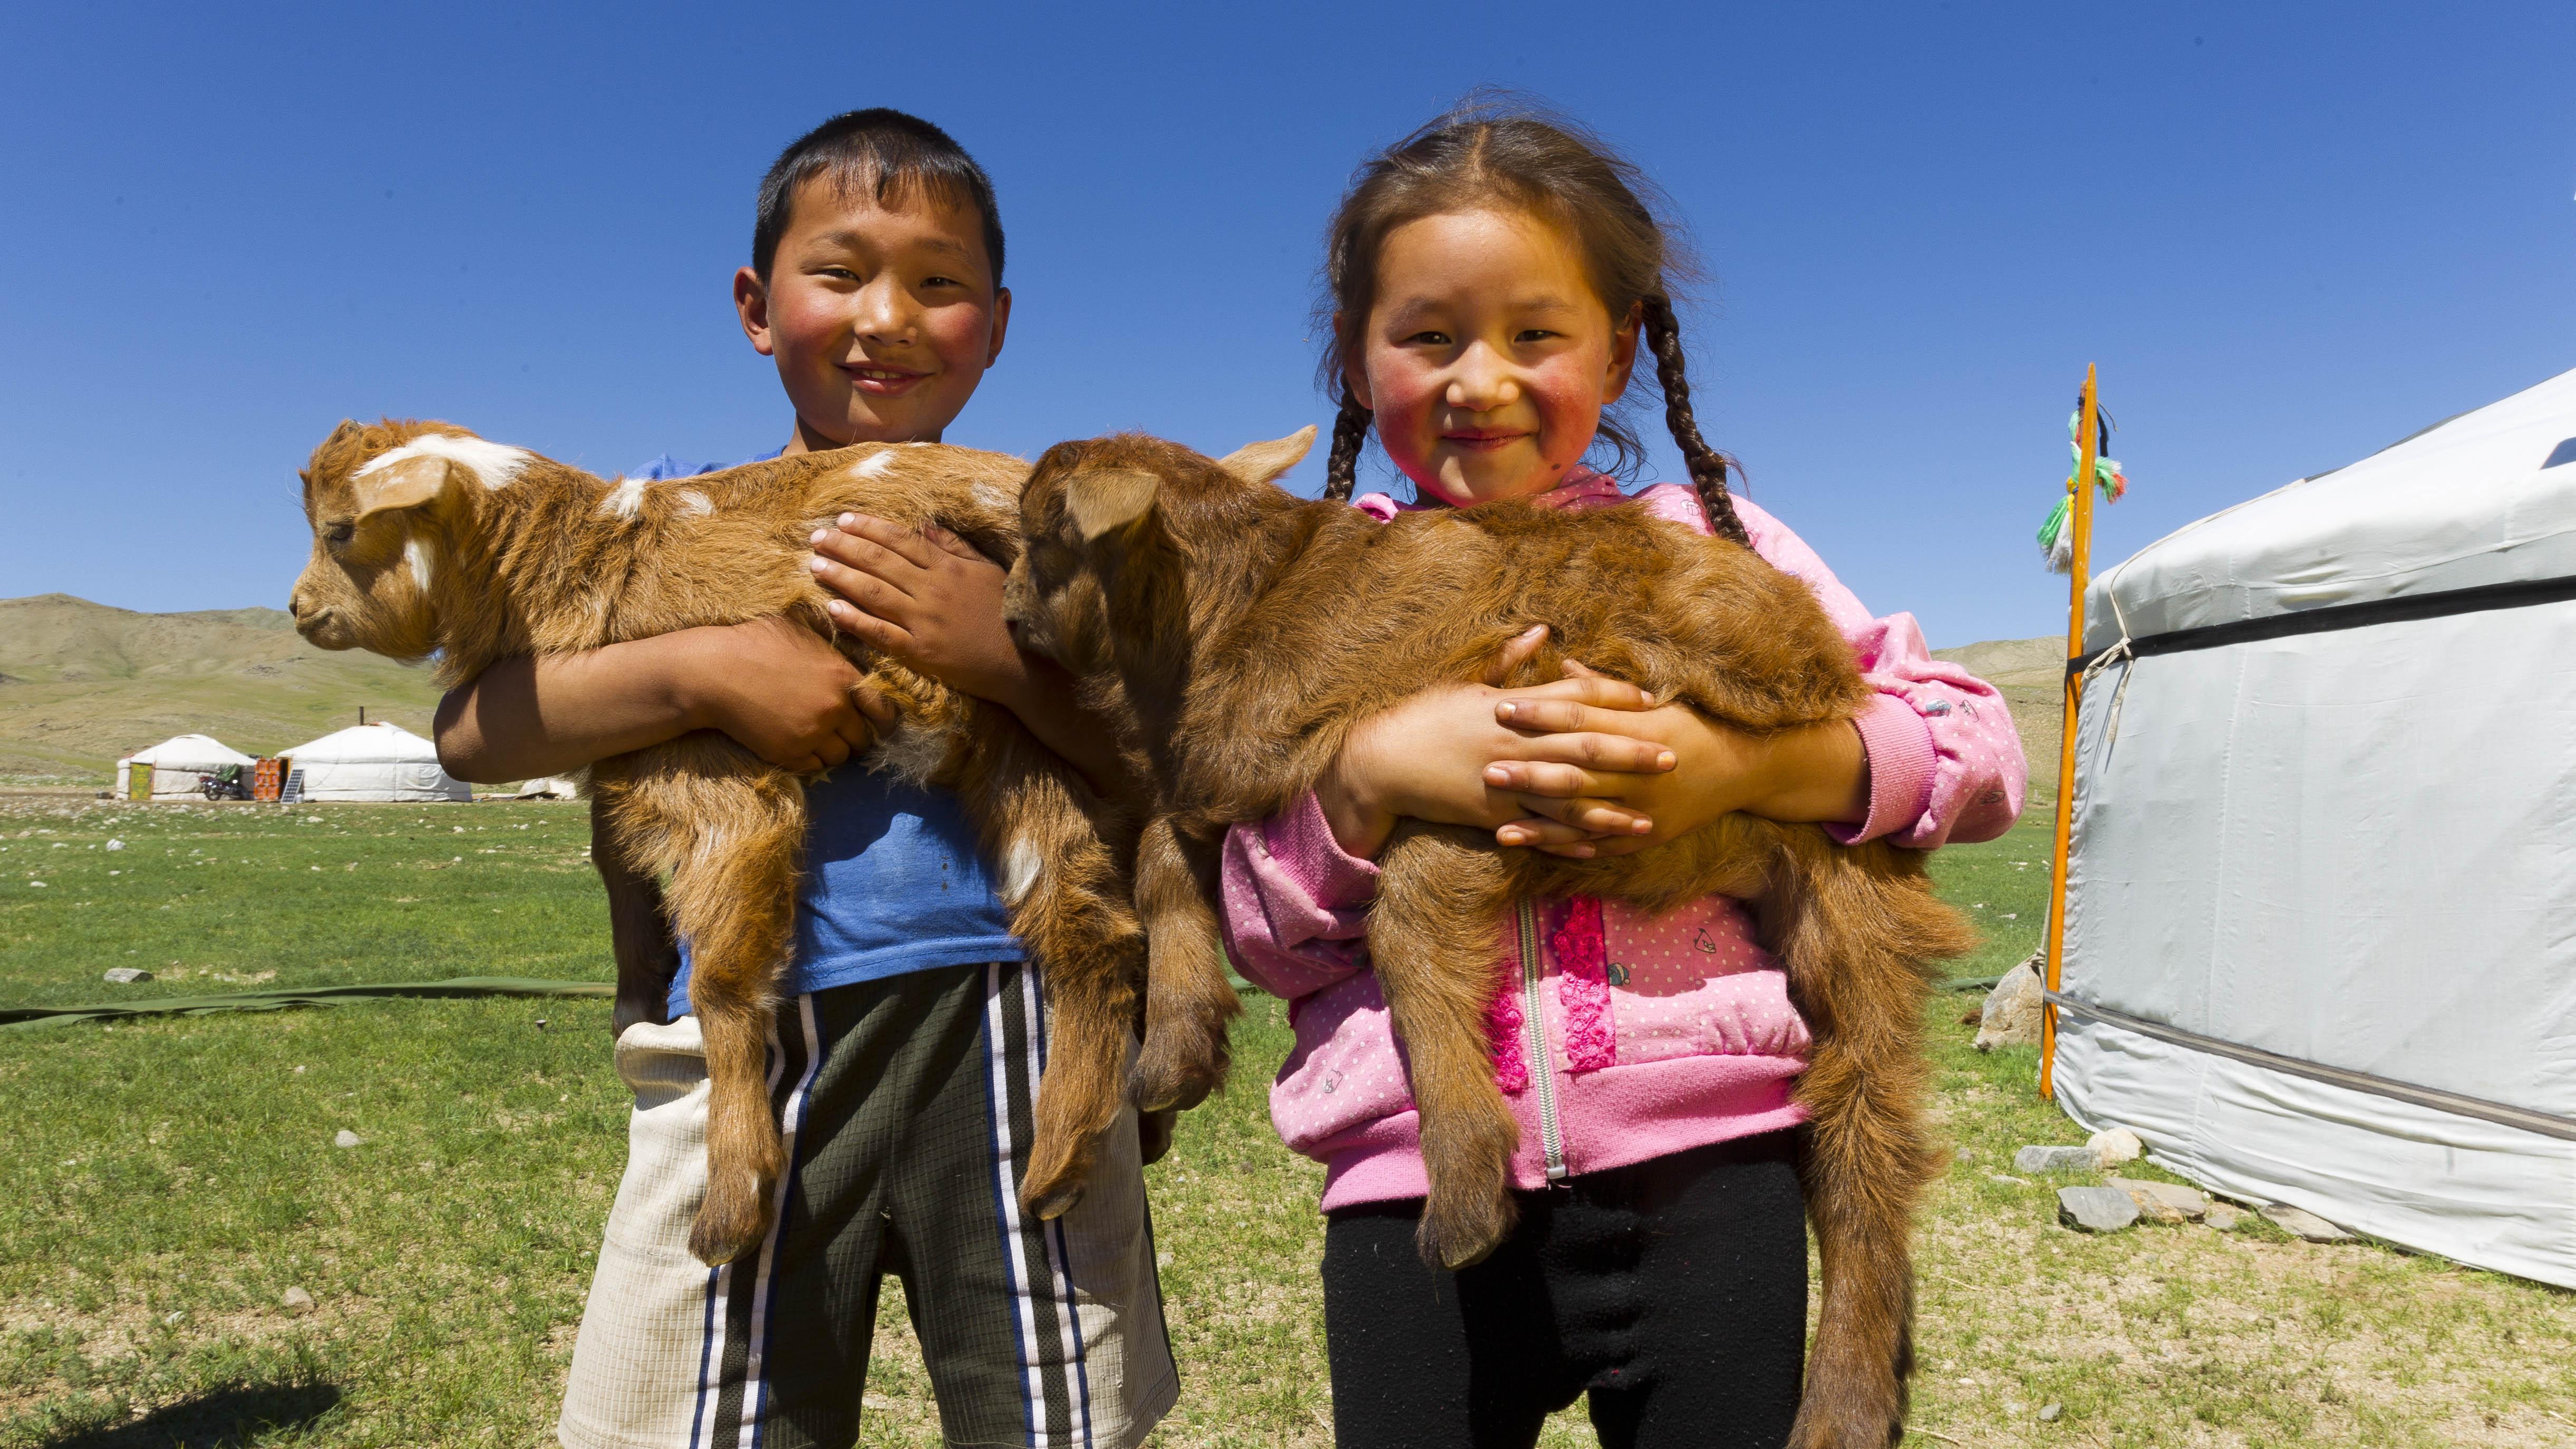 Demographics of mongolia horseback mongolia for Choupi et doudou a la piscine